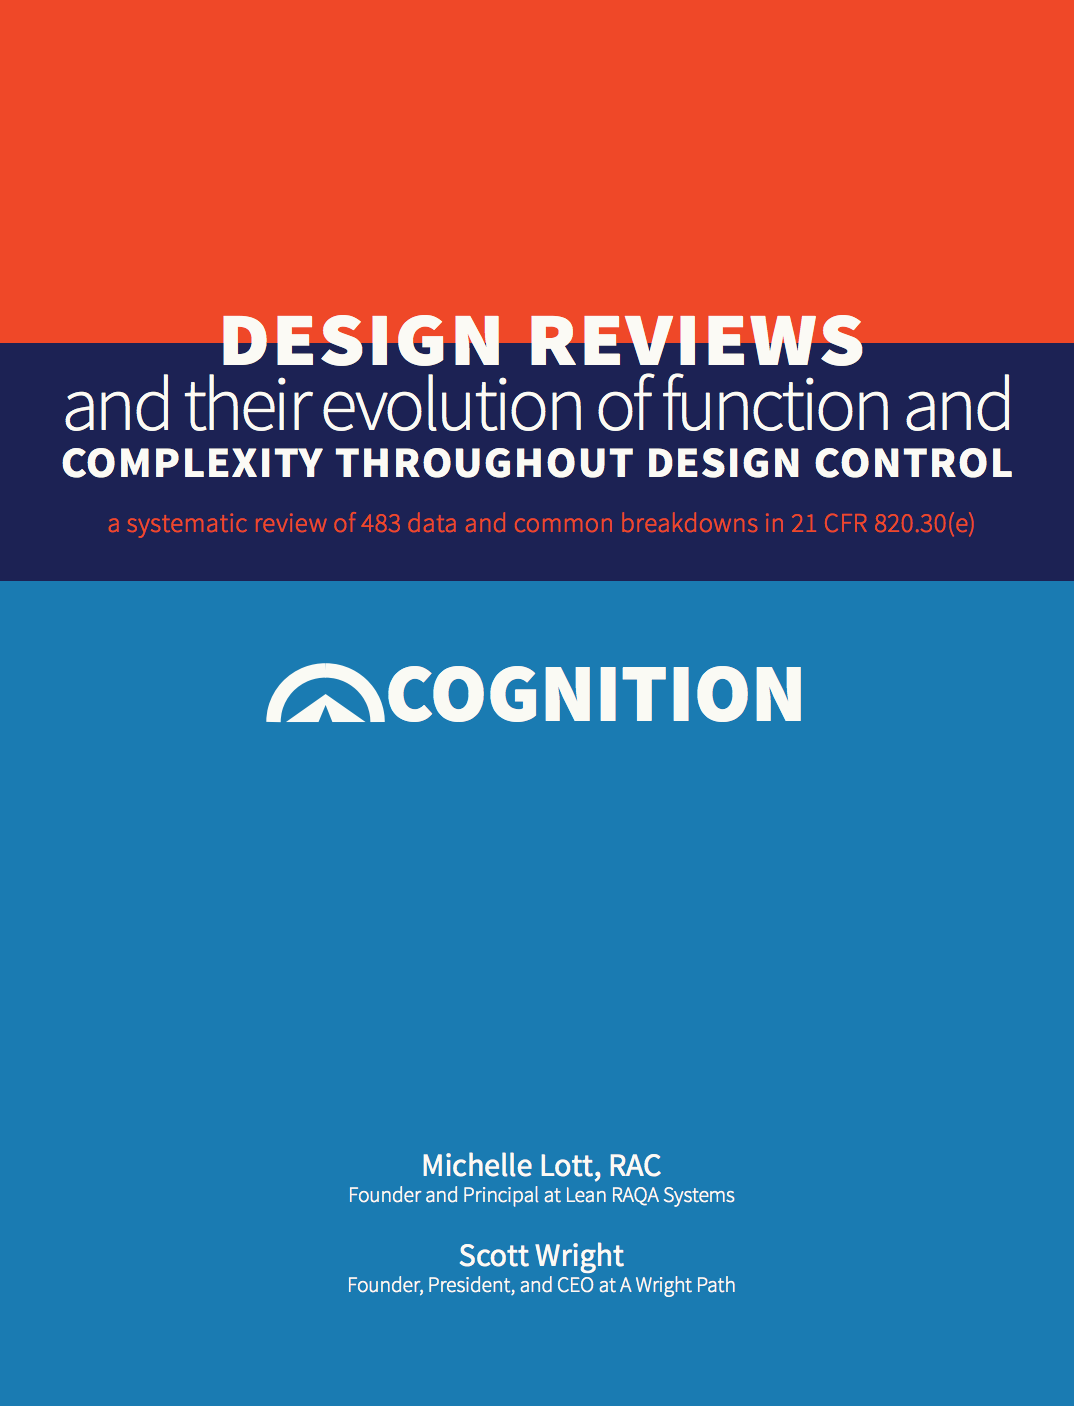 Design_Reviews_DC_WP.png